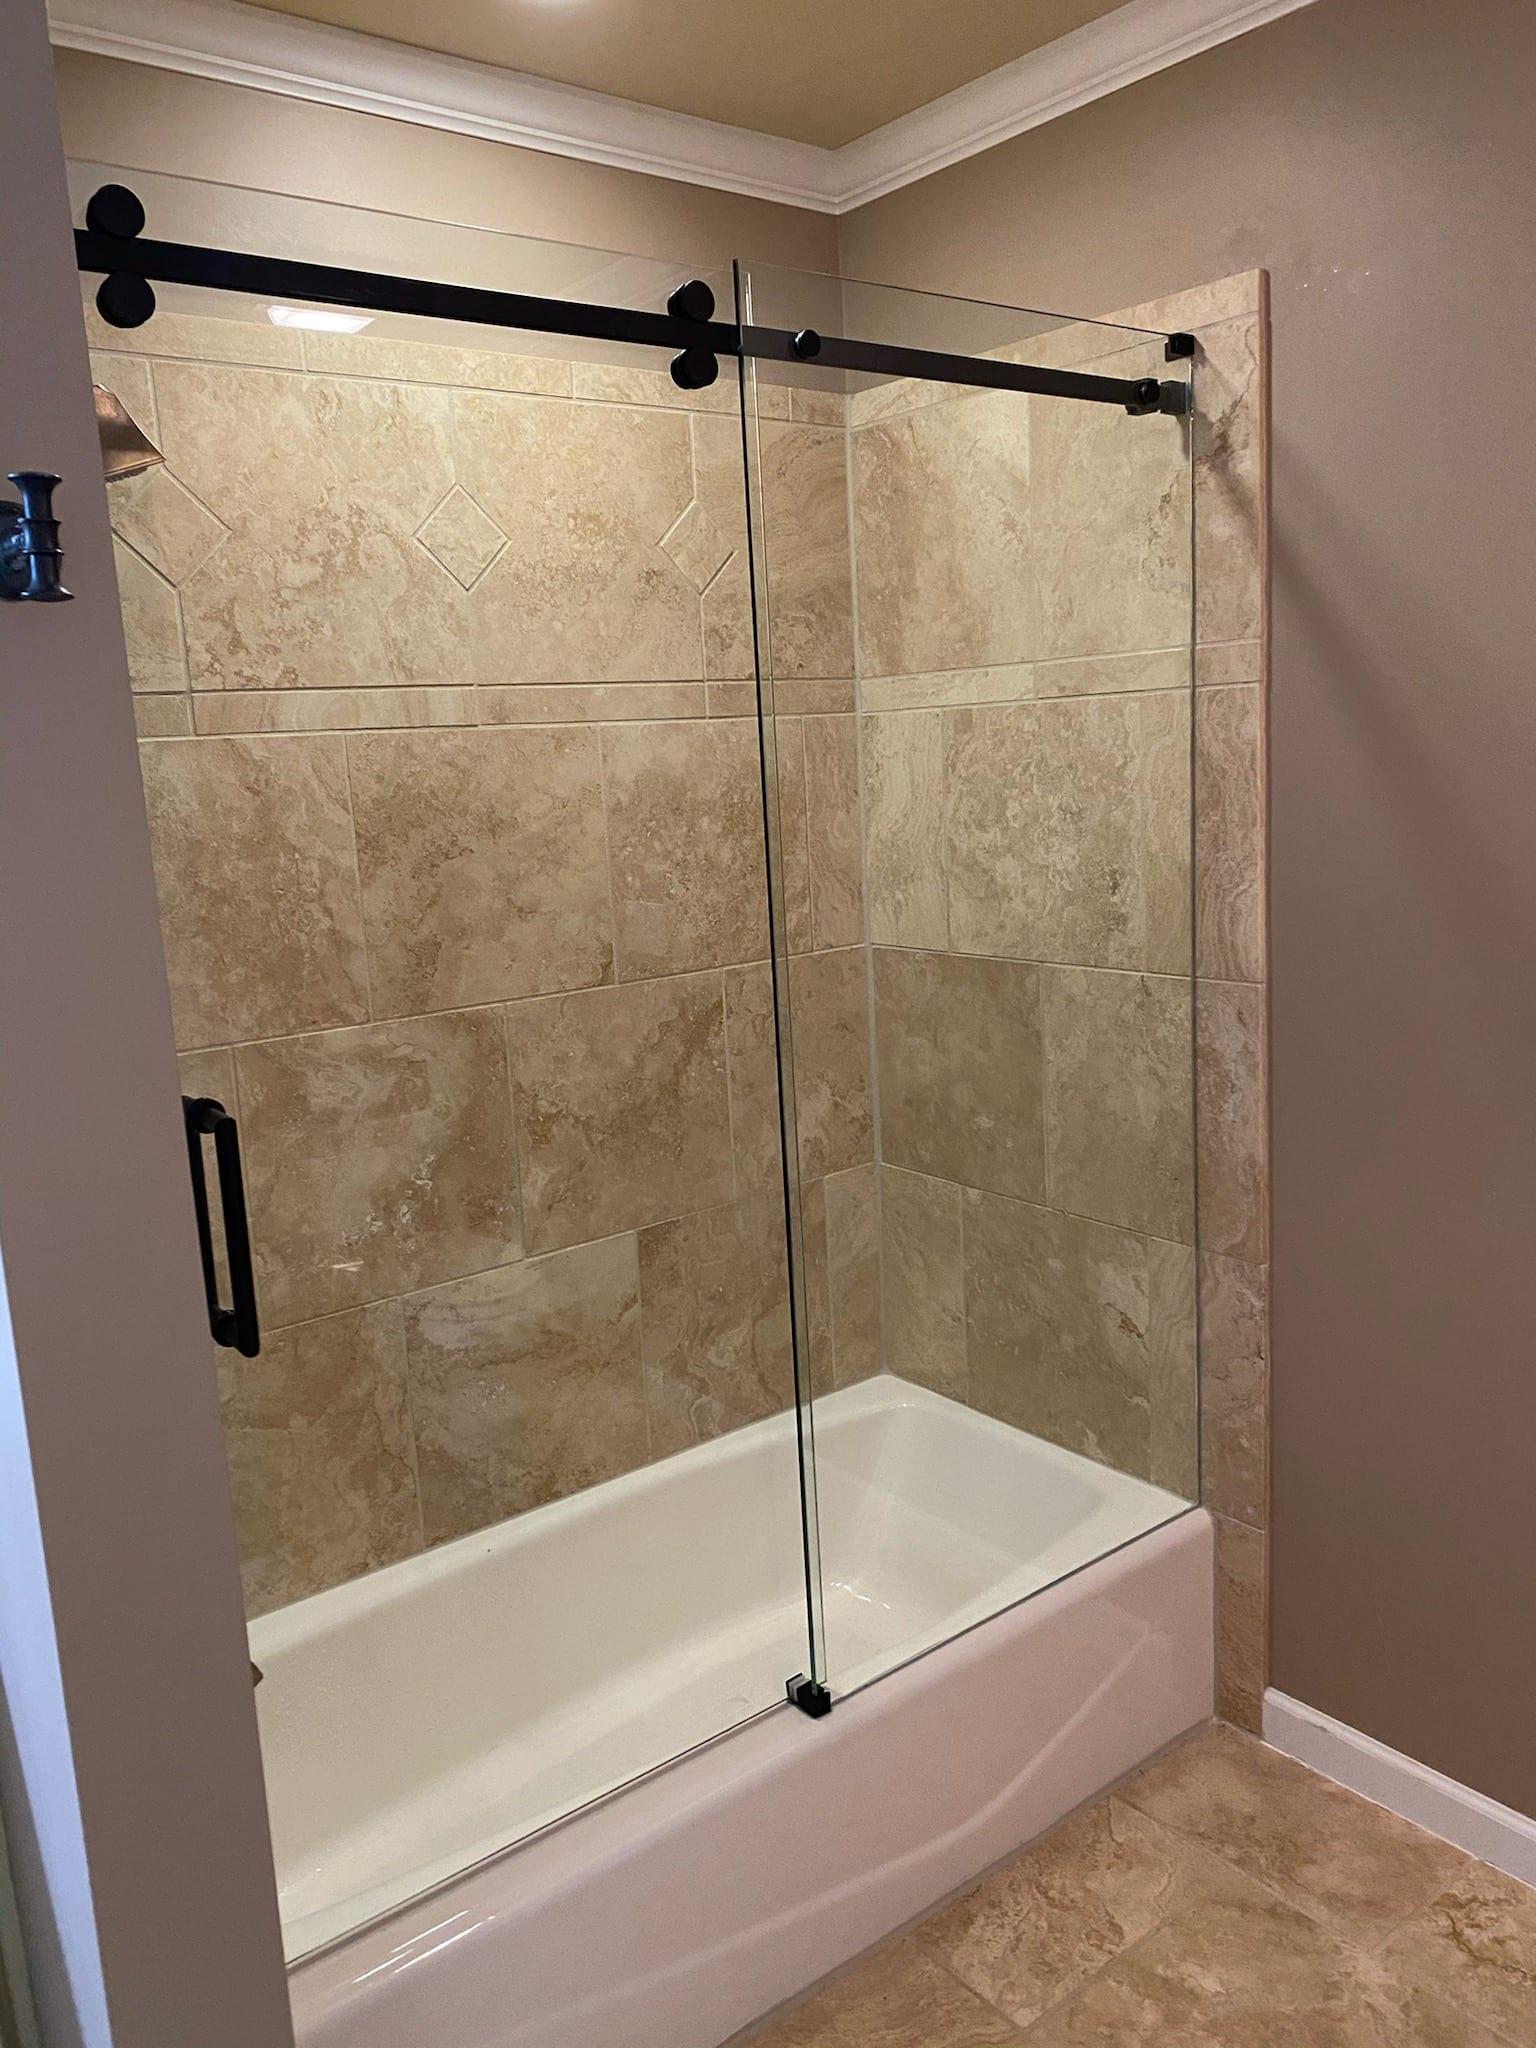 sliding shower door custom bathroom mirrors and decorative glass from Shower Doors of Nashville